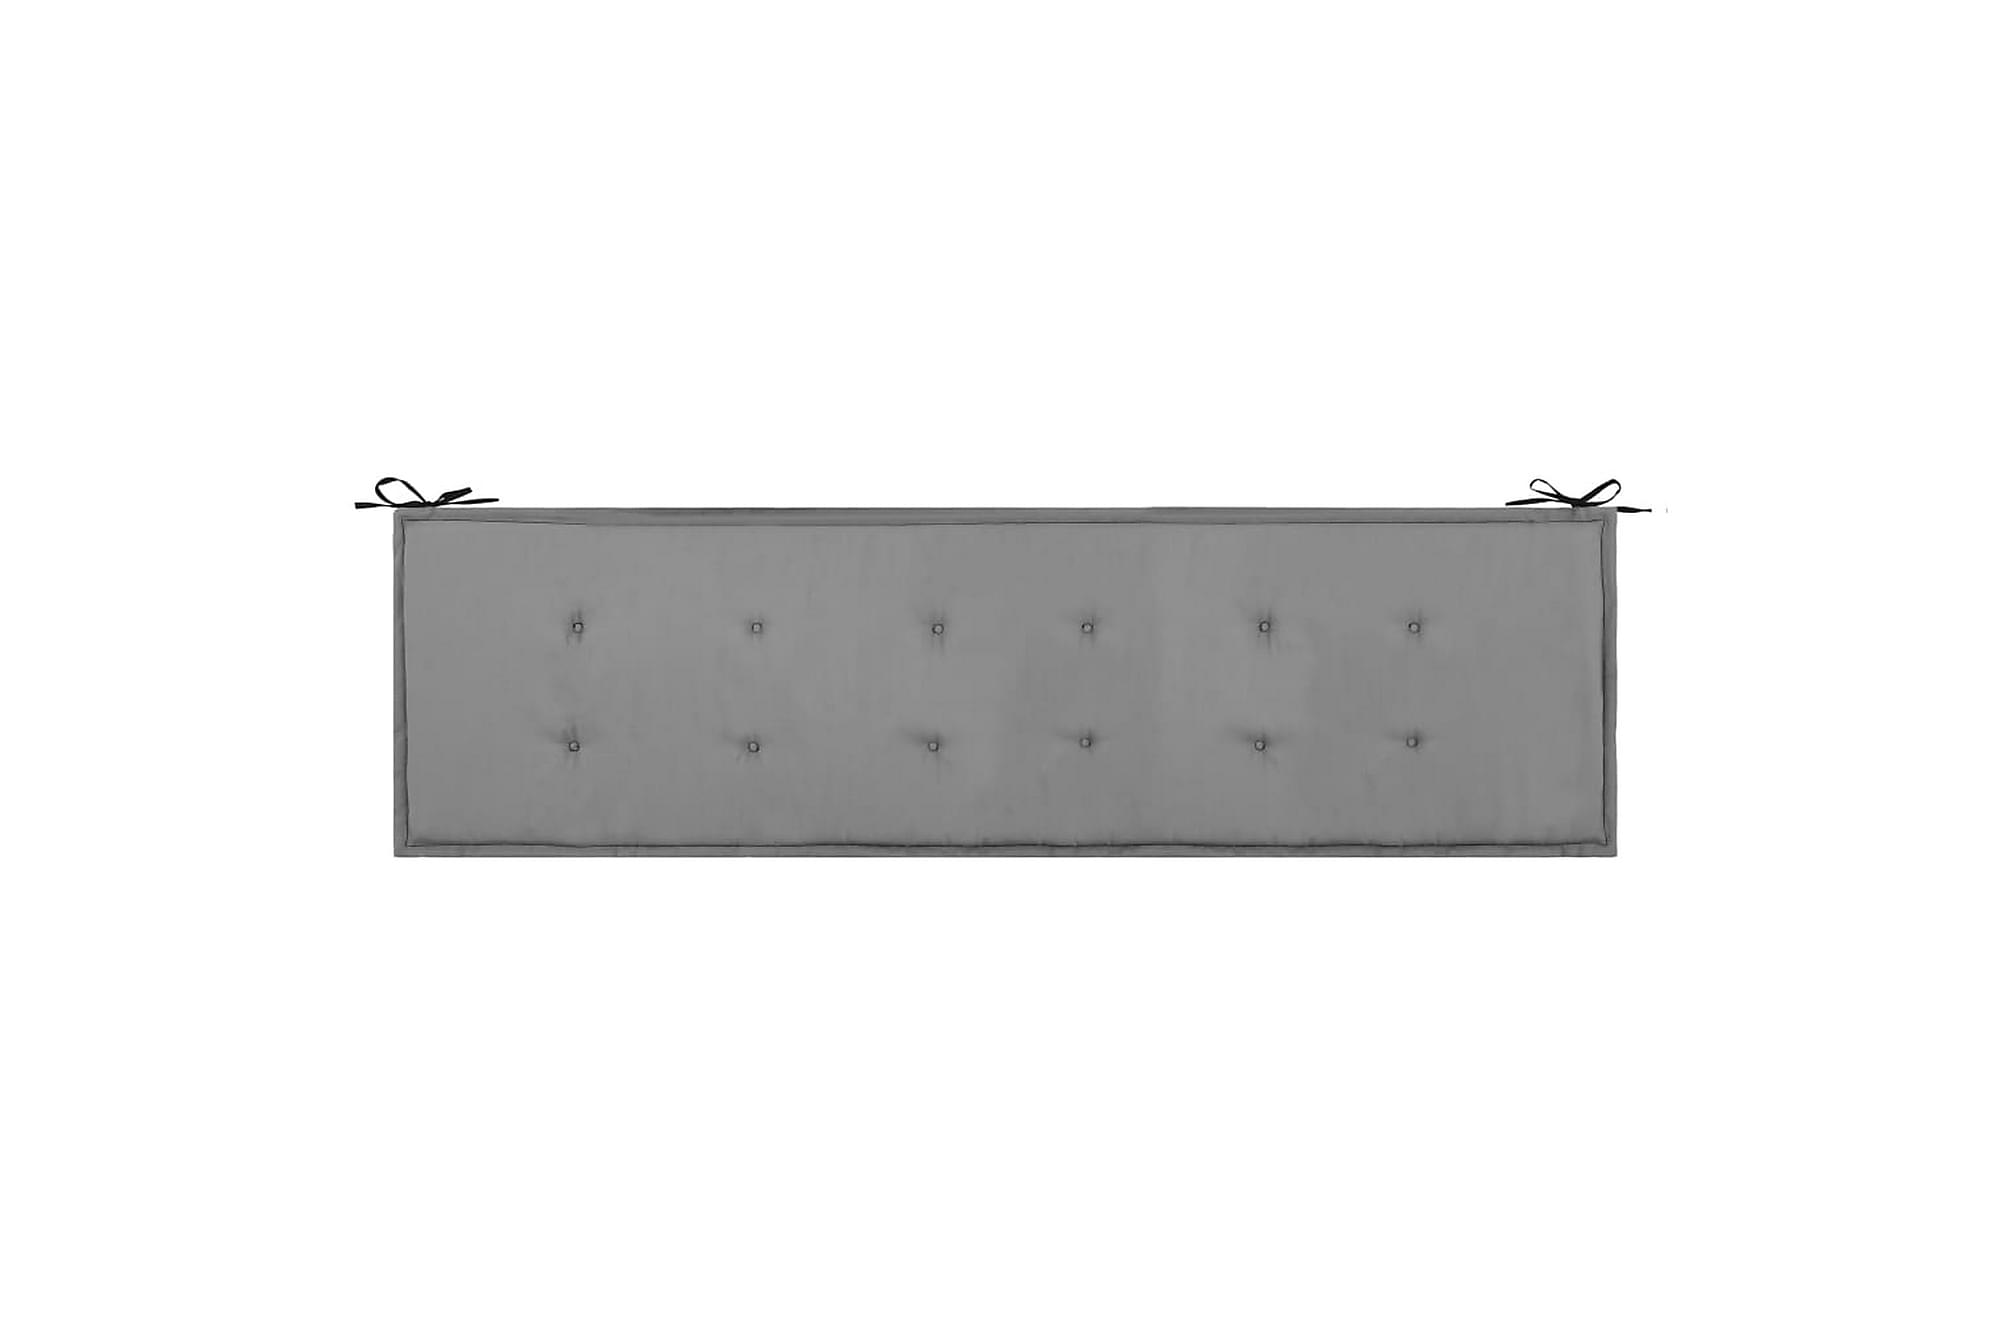 Bänkdyna för trädgården svart och grå 180x50x3 cm, Soffdynor